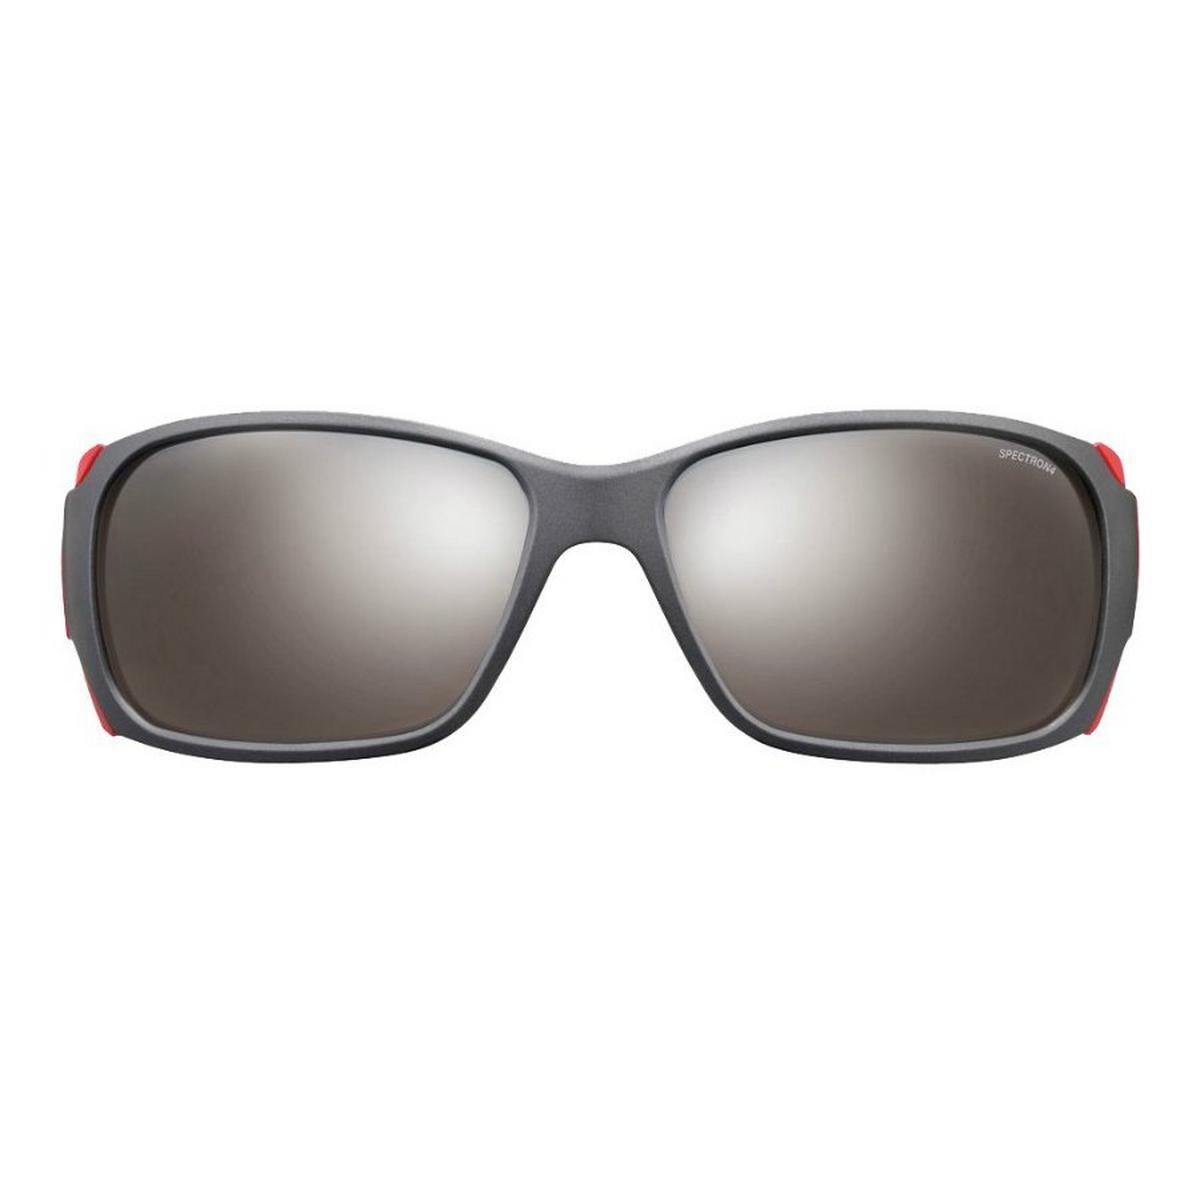 Julbo Men's Montebianco Spectron 4 Sunglasses